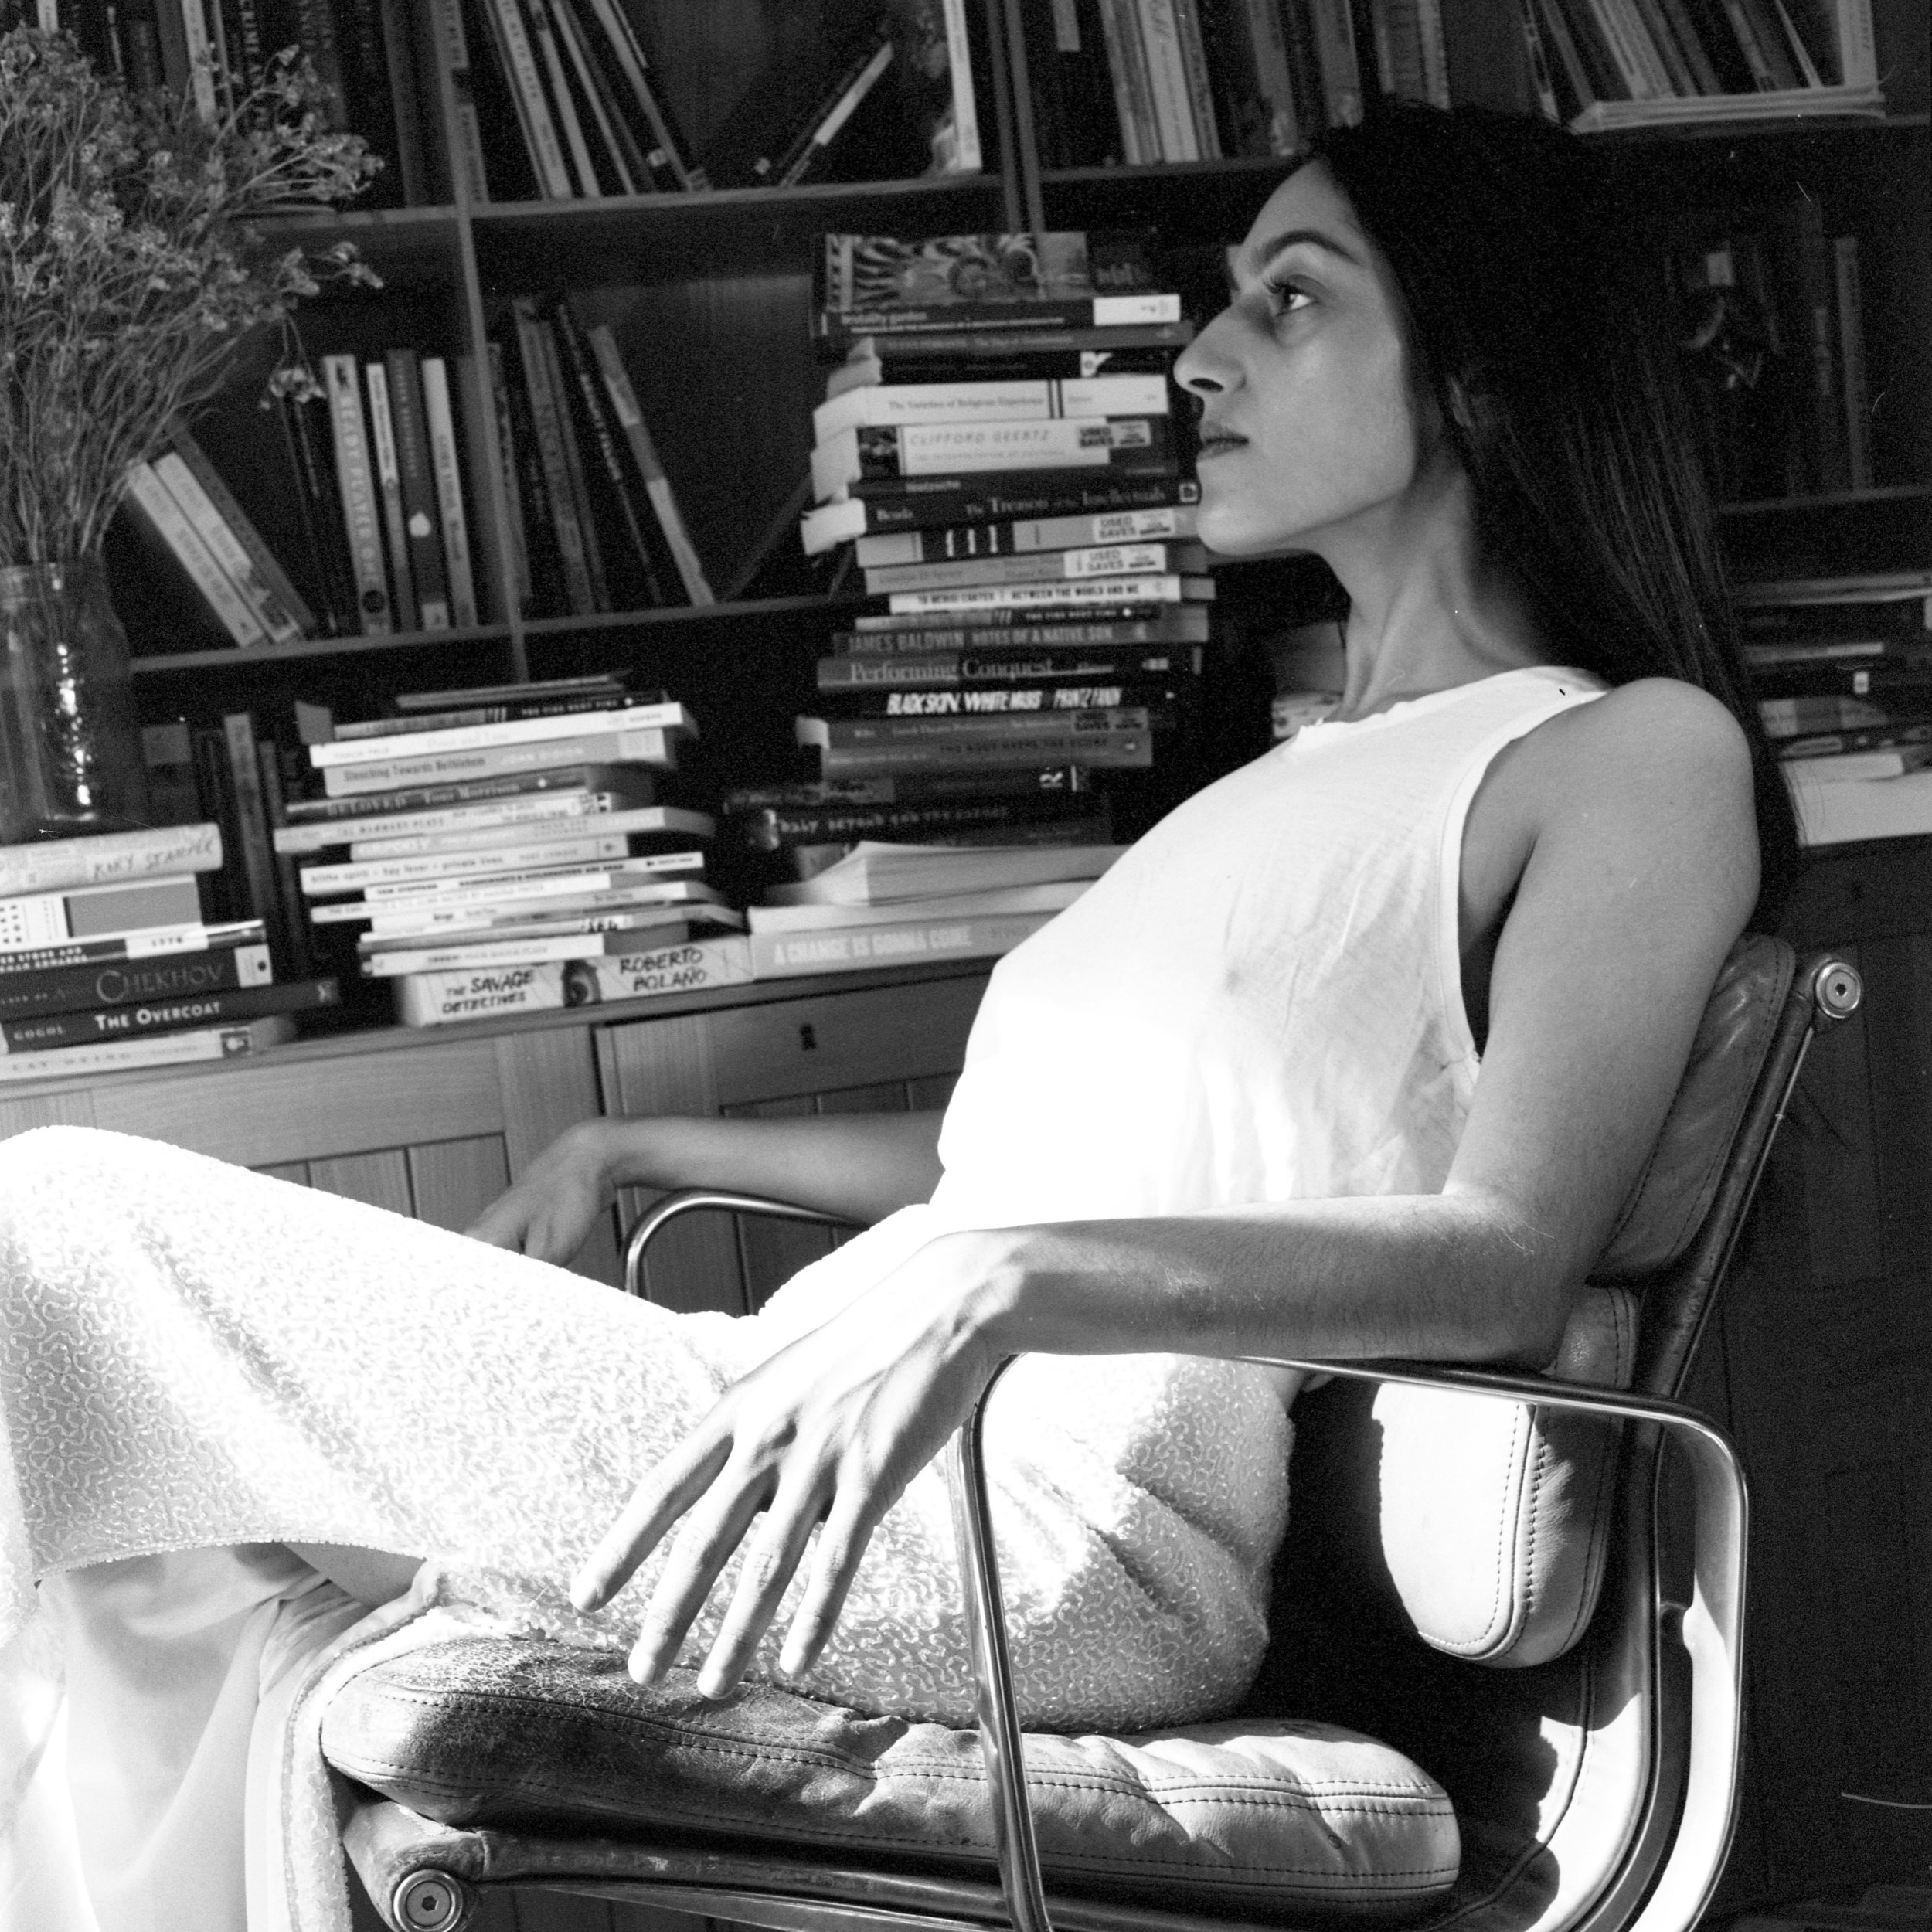 Deepali Gupta - Nothing to hide.